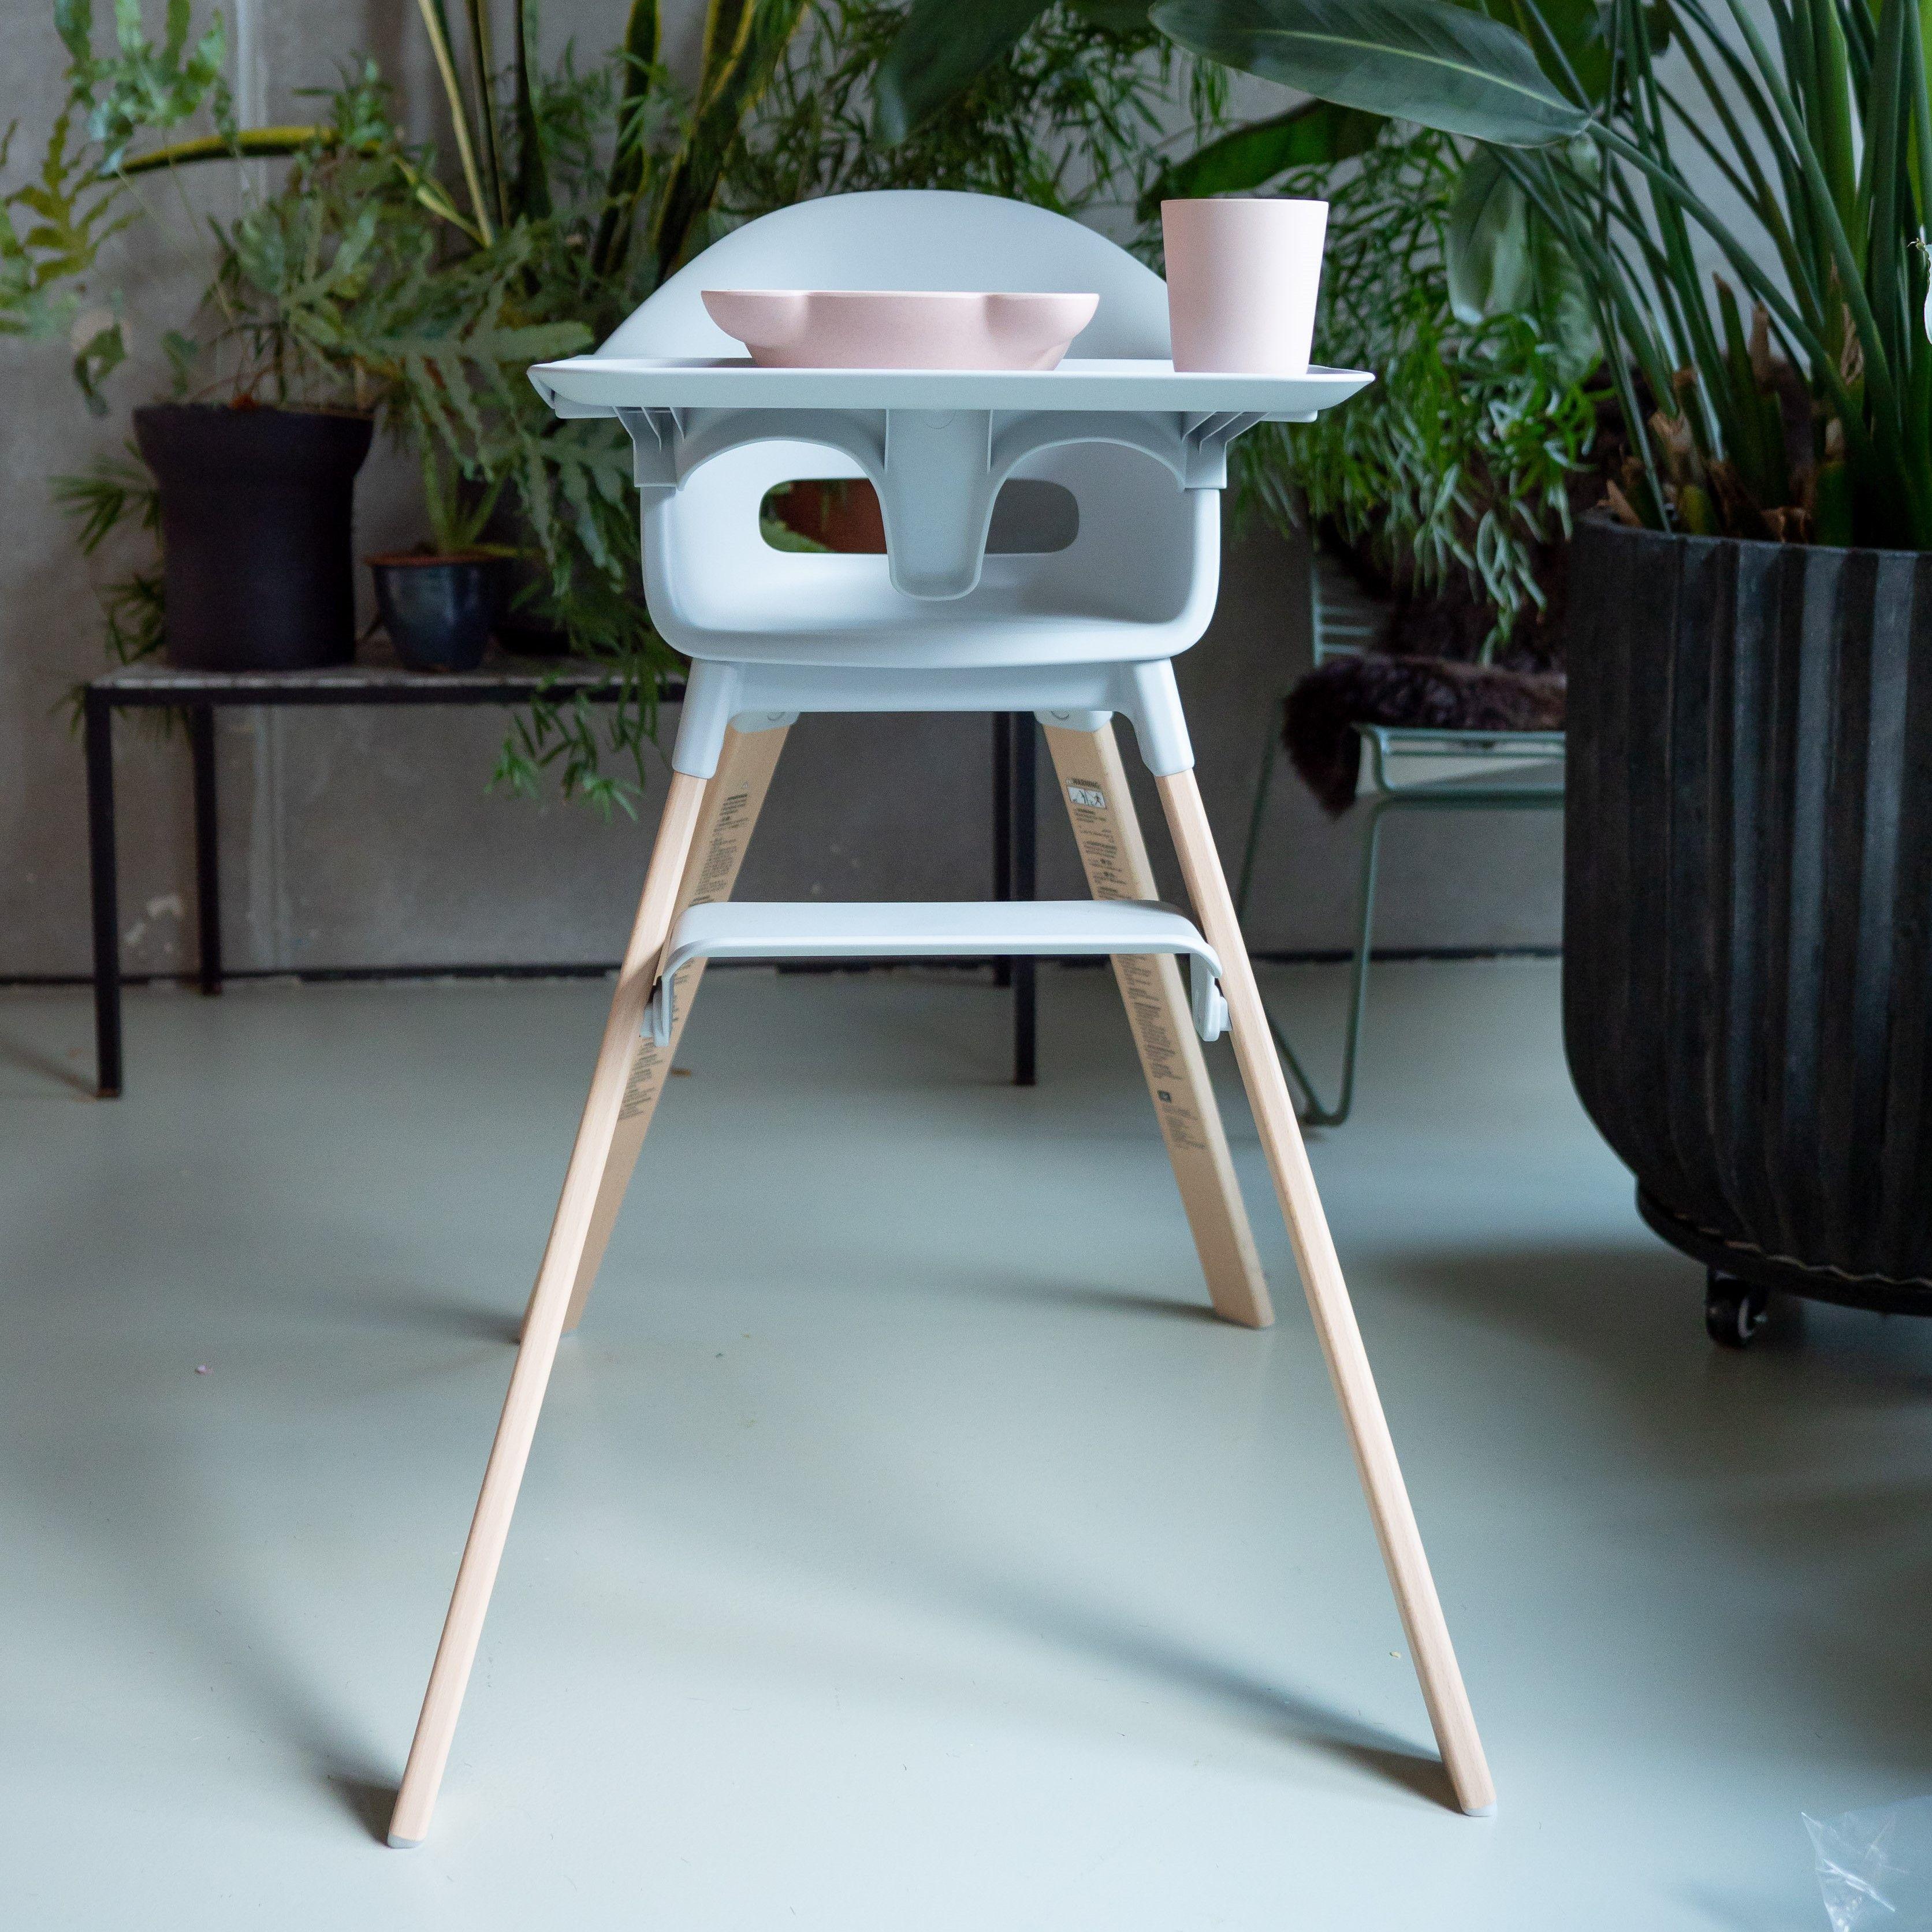 Stokke Clikk High Chair Soft Pink In 2020 Chair High Chair European Beech Wood